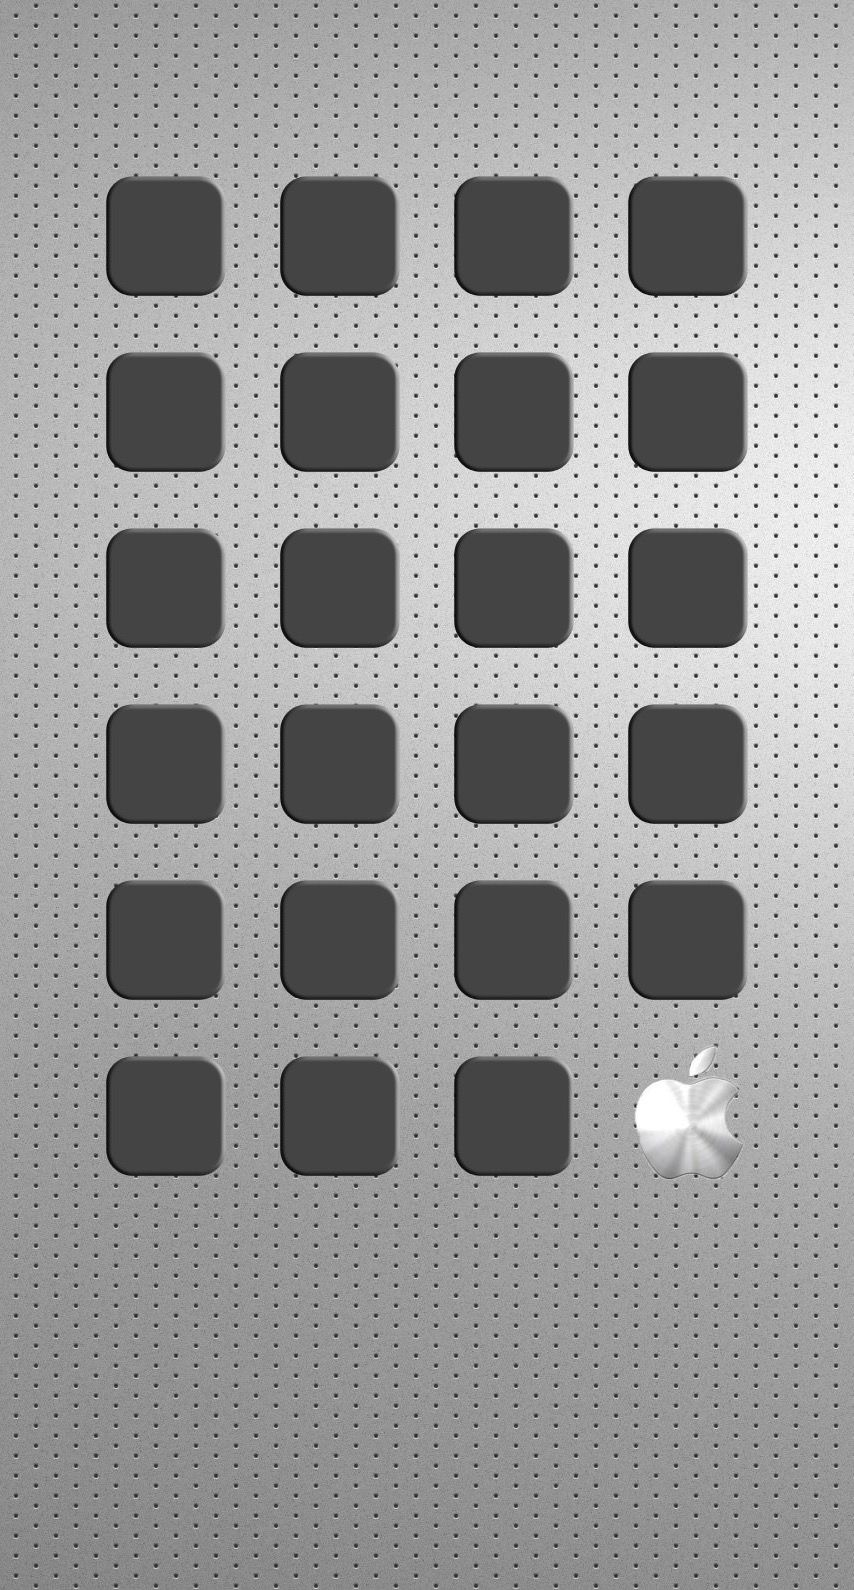 Apple Logo Shelf Gin Cool Wallpaper Sc Iphone6s Iphone Homescreen Wallpaper Iphone 6s Wallpaper Iphone 7 Plus Wallpaper